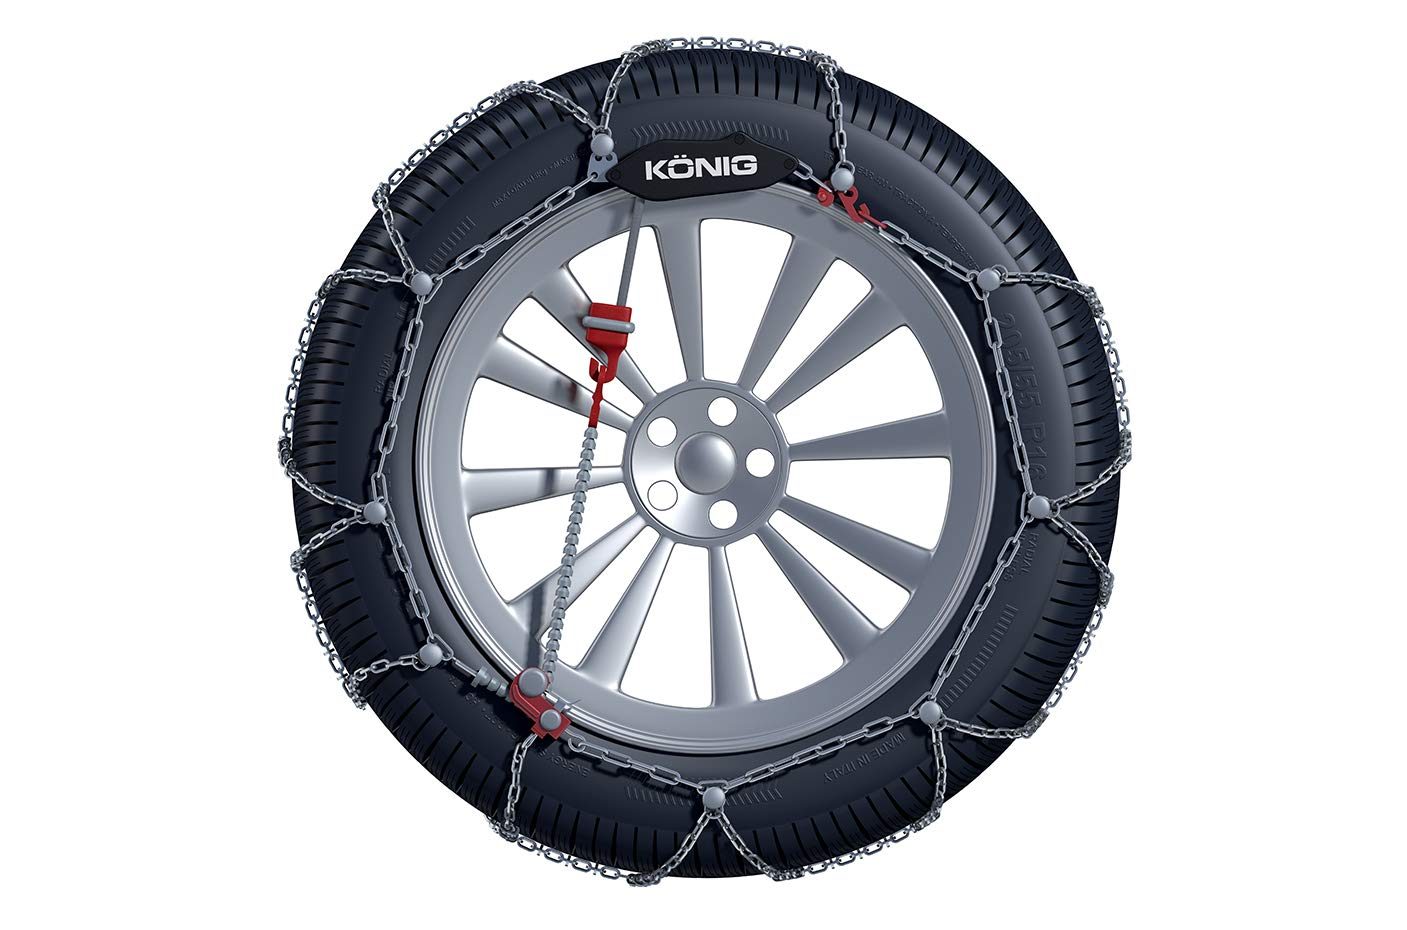 K/ÖNIG CL-10 100 Snow chains set of 2